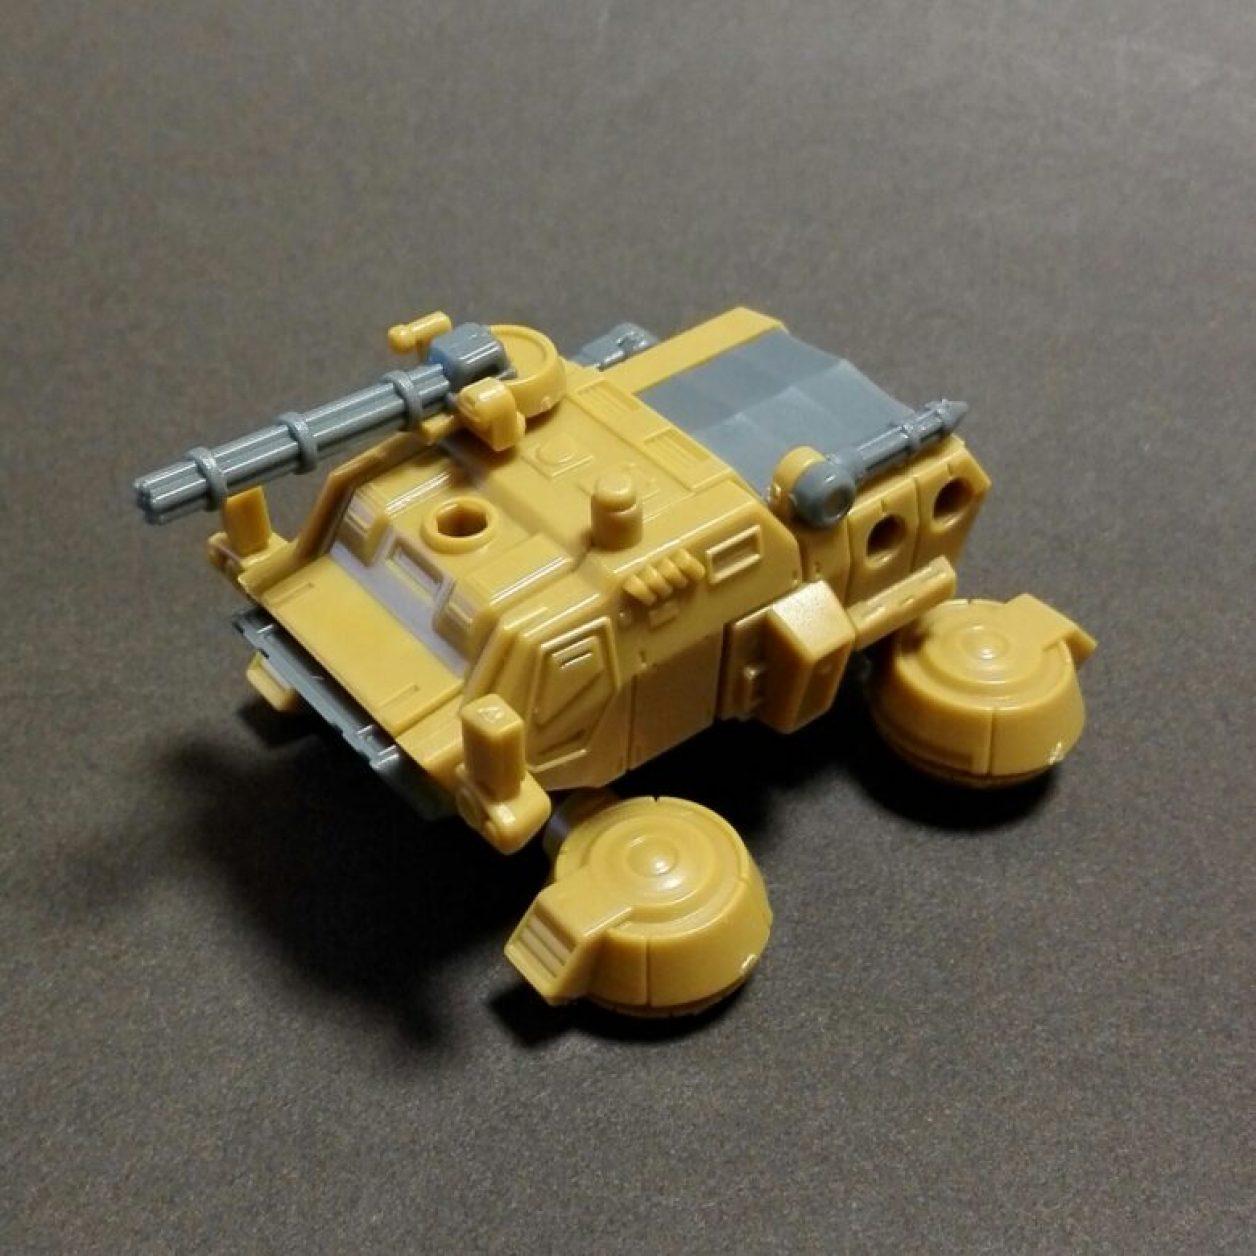 MOBILE SUIT ENSEMBLE(モビルスーツアンサンブル)09弾より機動戦士ガンダムに登場するホバートラックの組立方法の画像